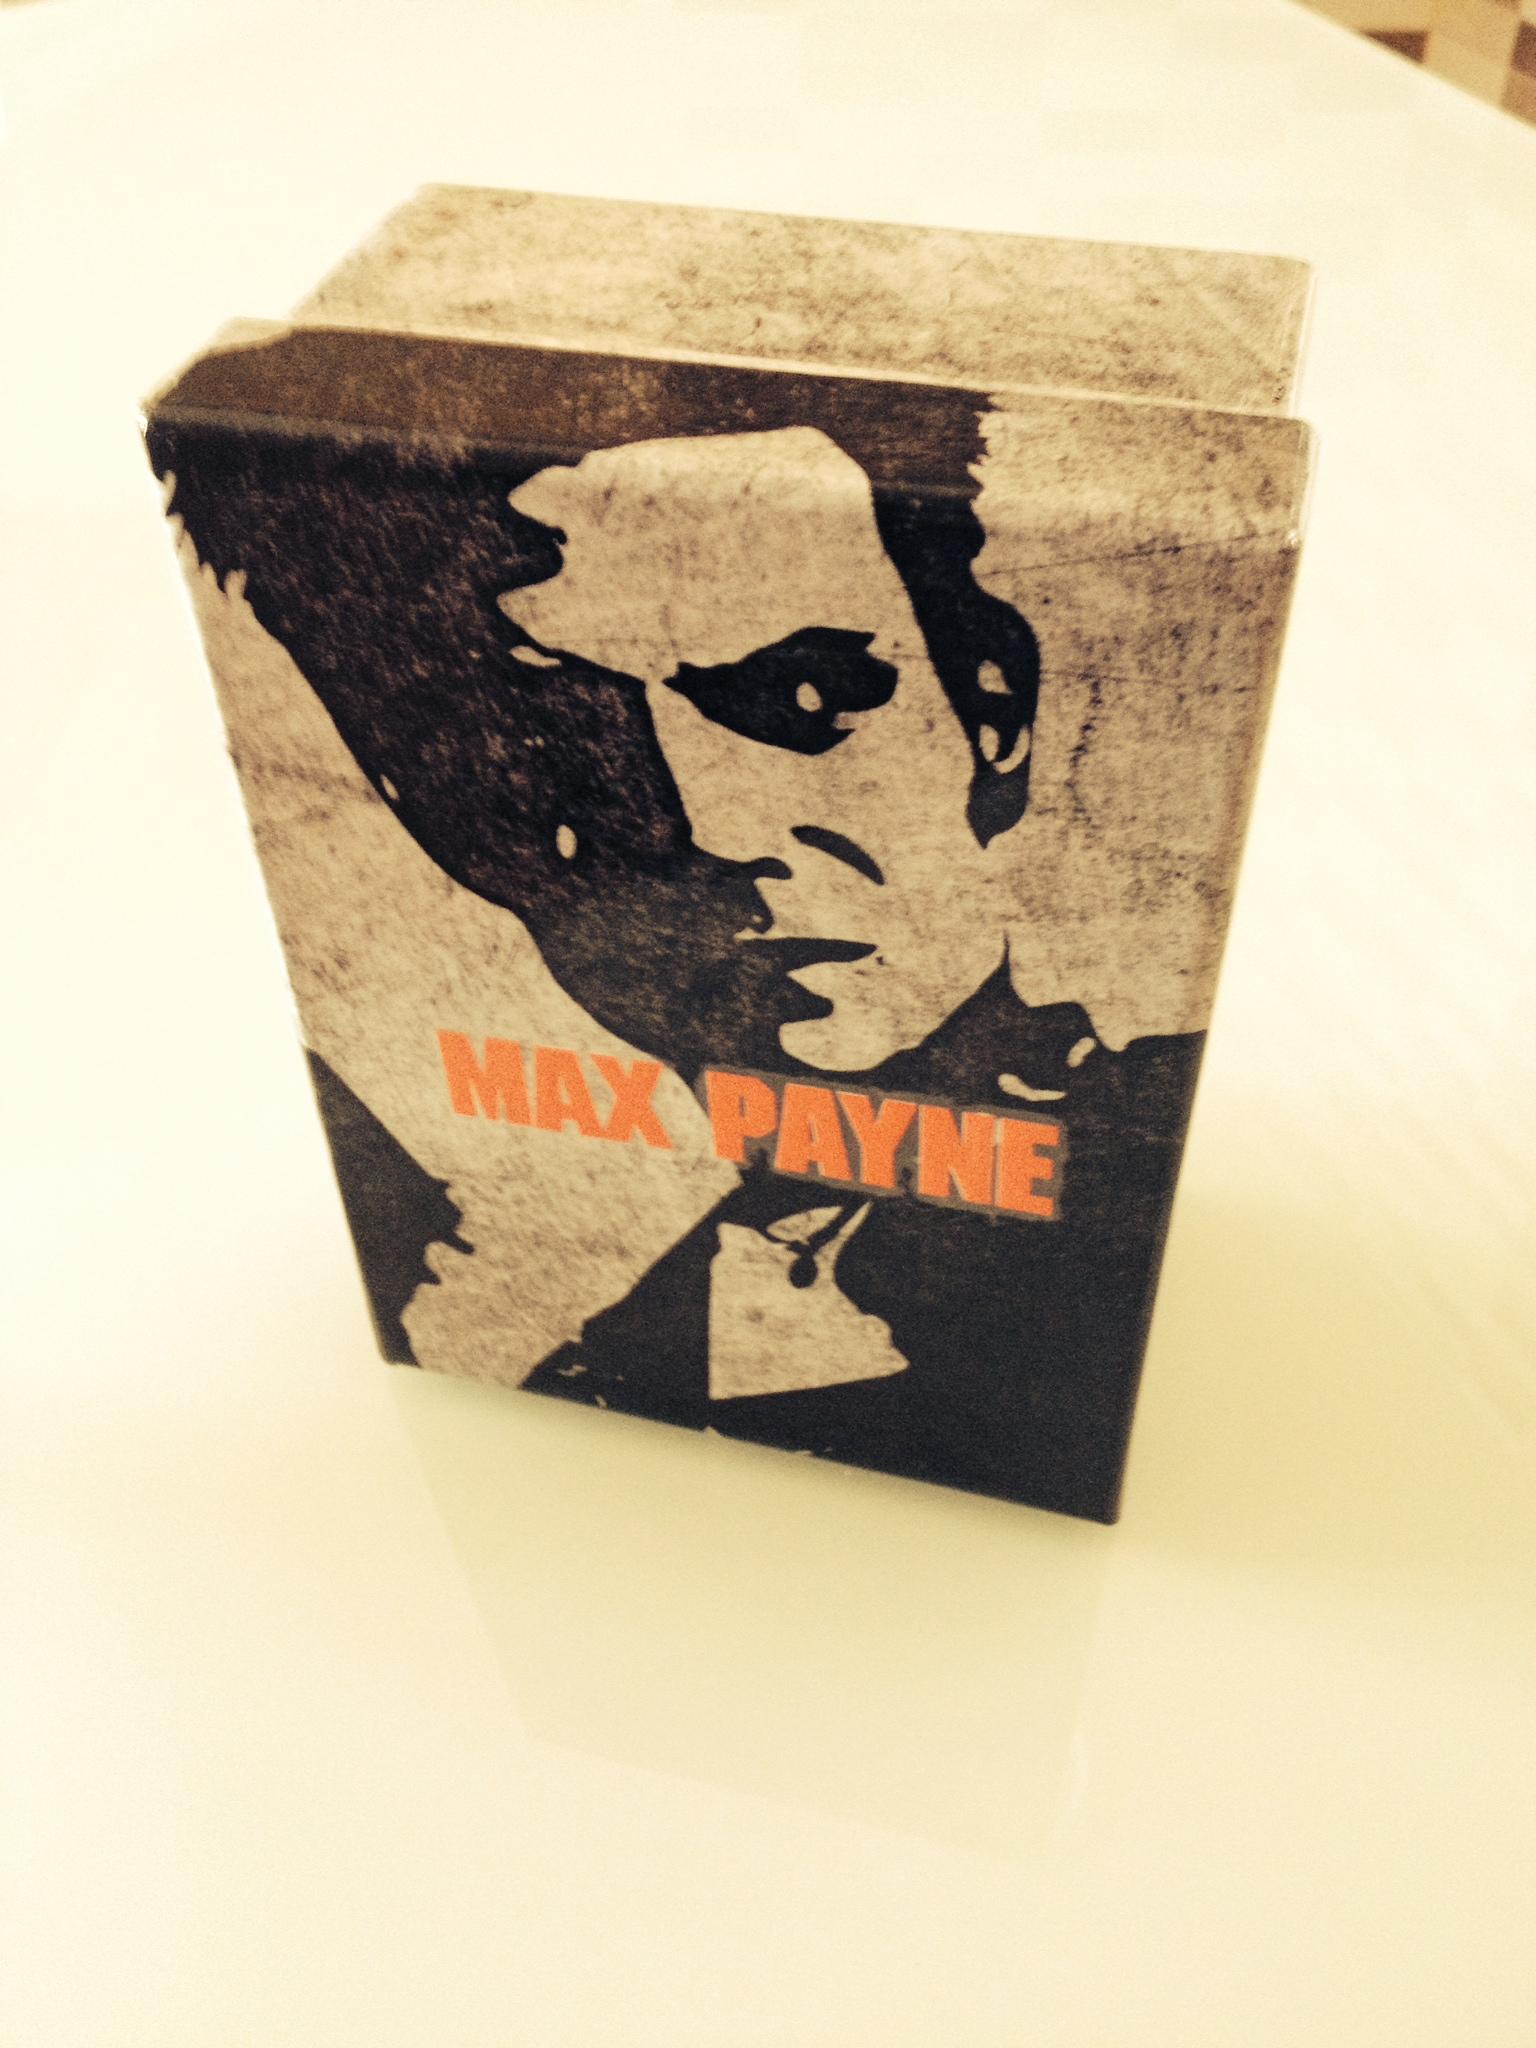 Vaso Max Payne